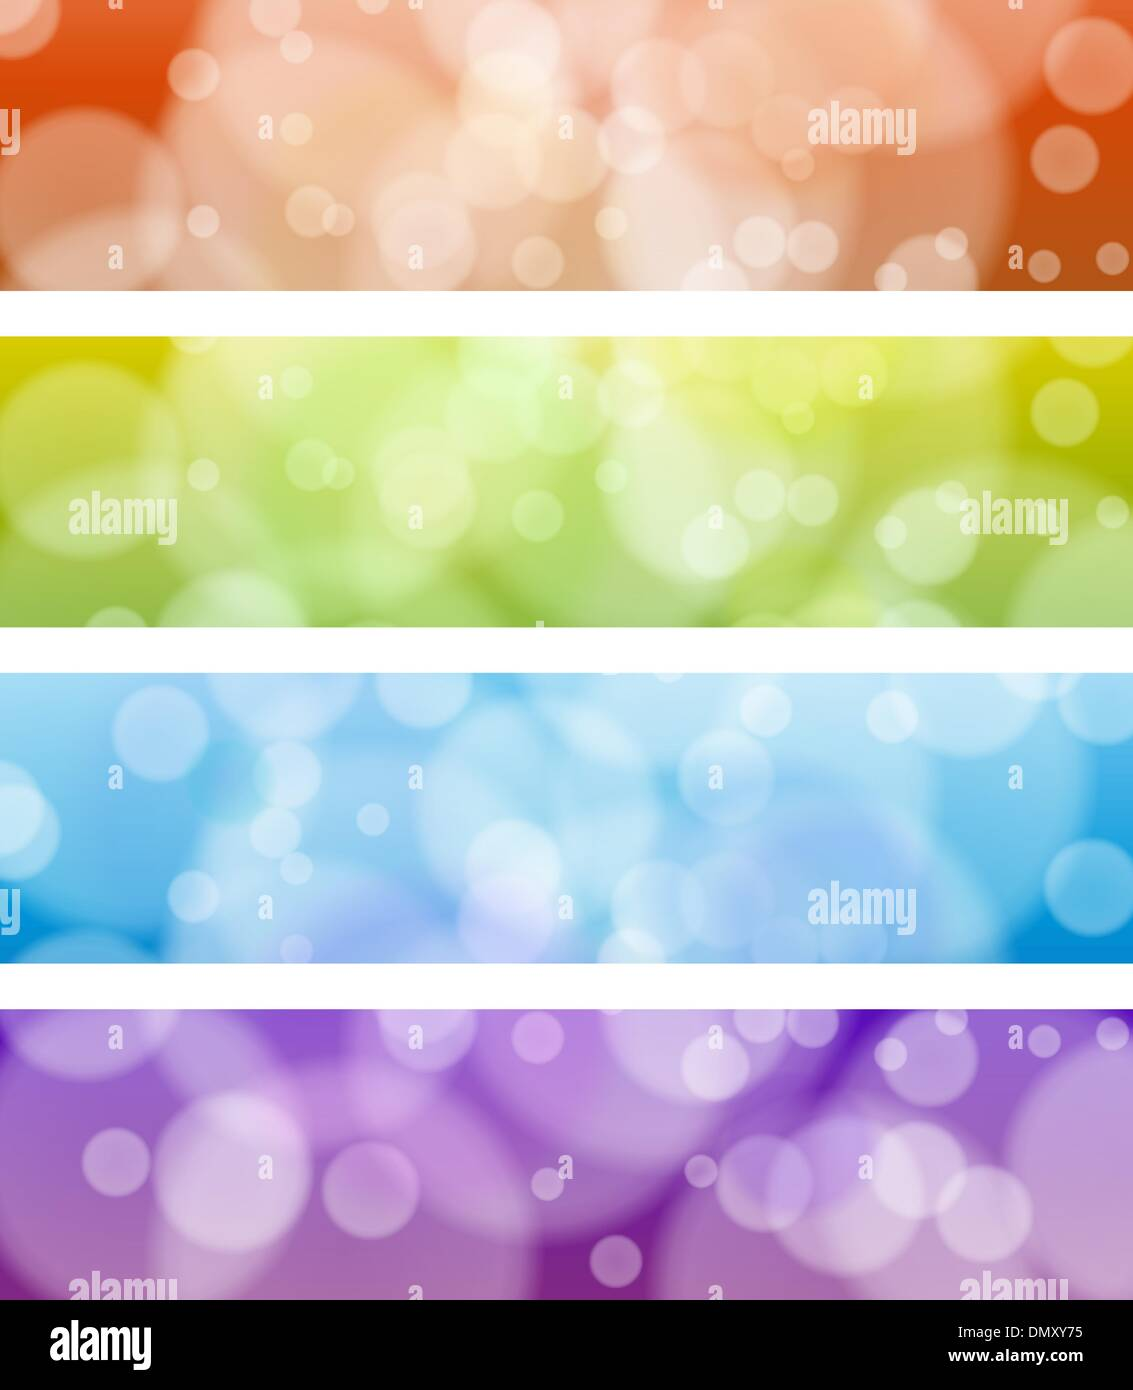 Web banners - Stock Image